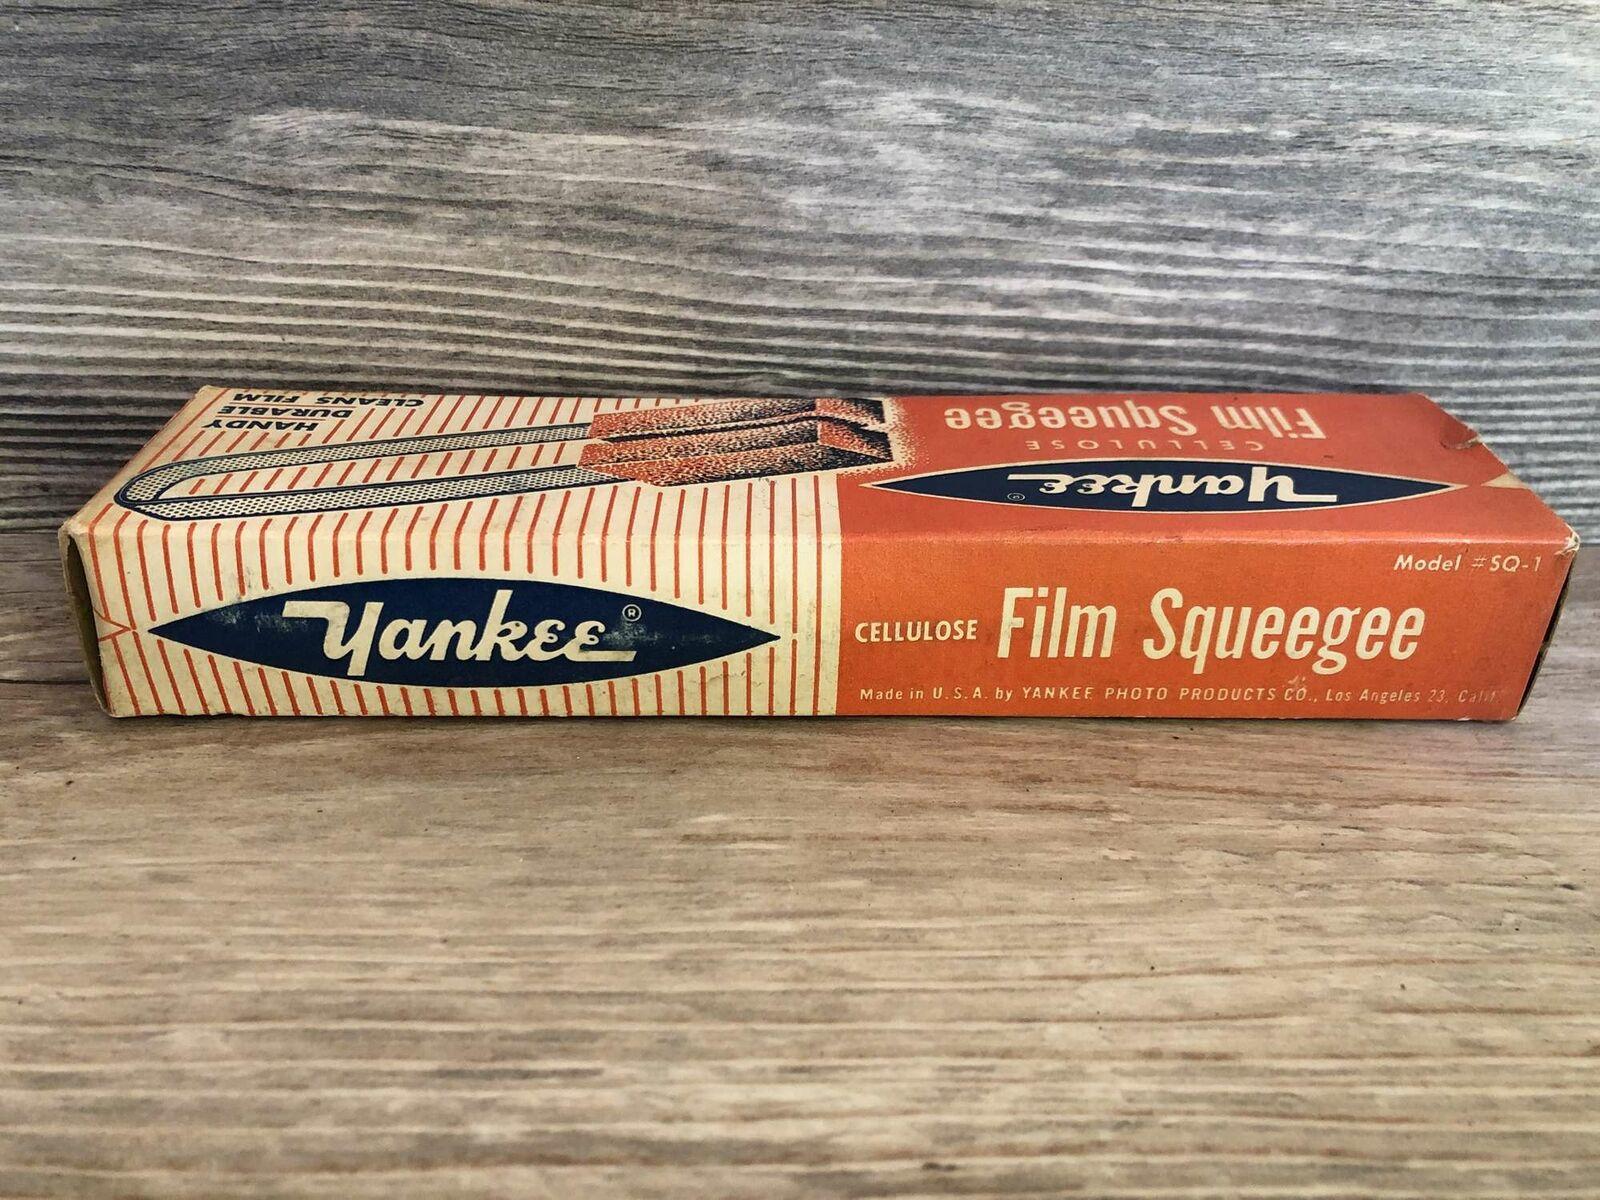 Vintage Yankee Cellulose Film Squeegee Model SQ-1 - $12.00